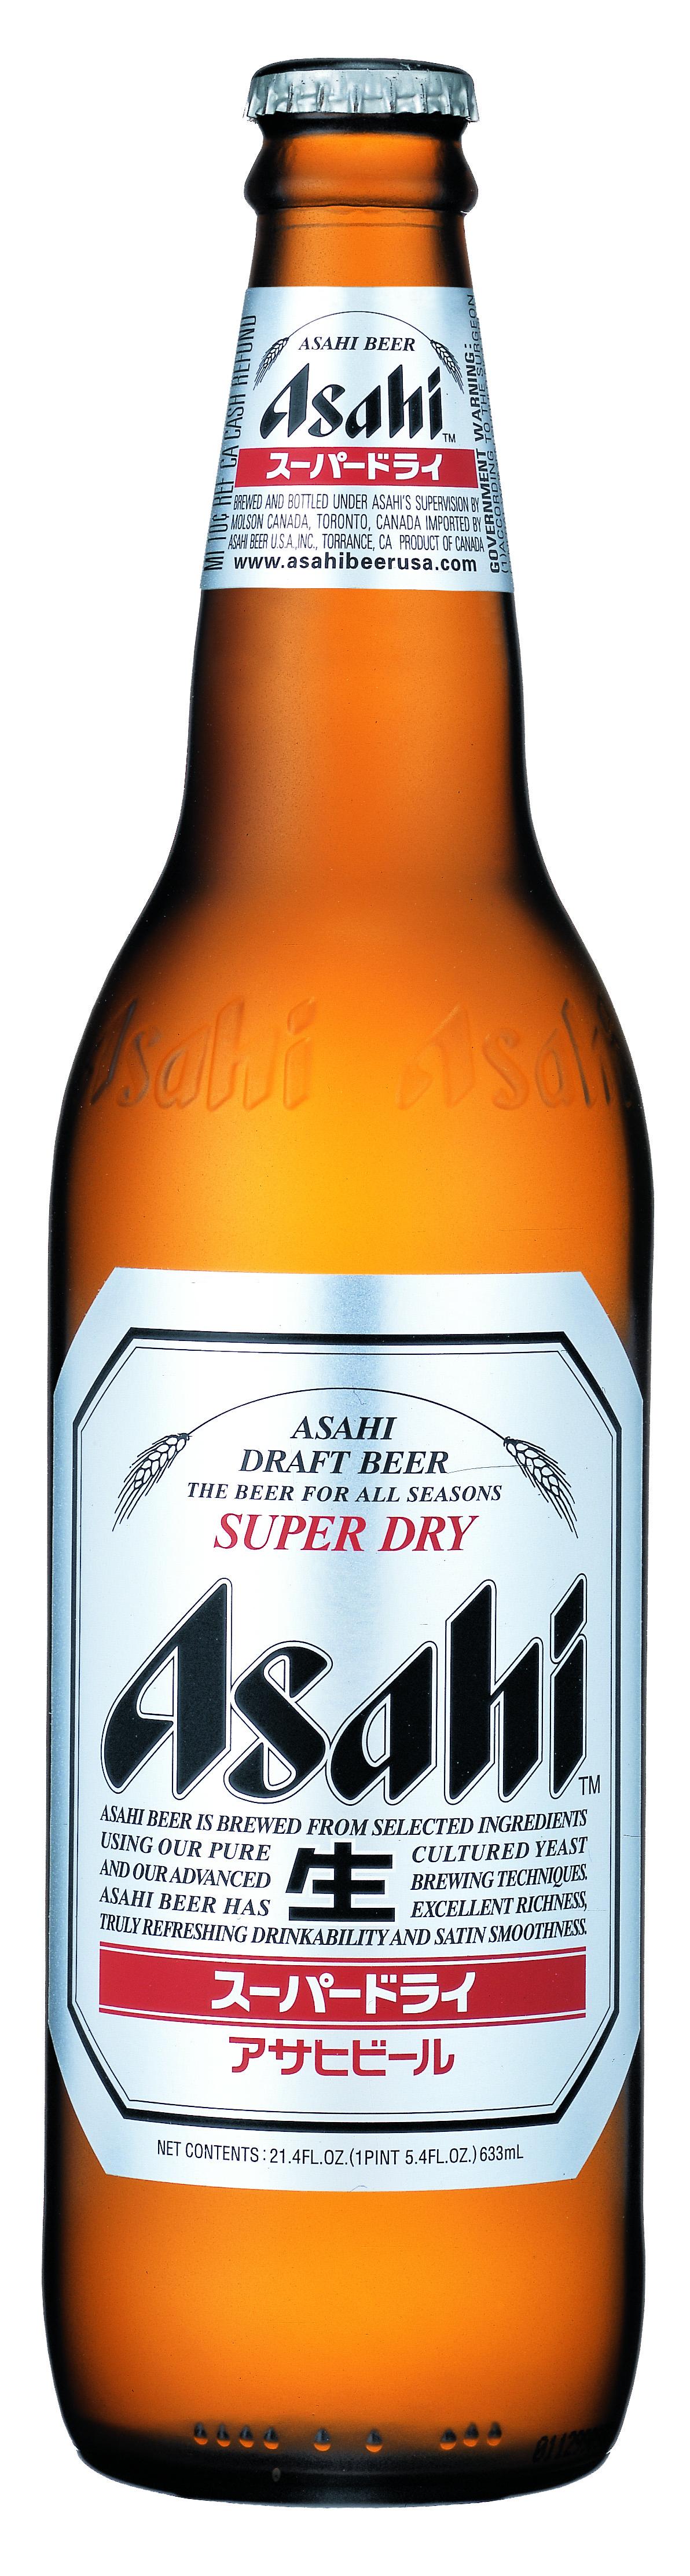 ASAHI KURONAMA BLACK STYLE: MUNICH DUNKEL LAGER ORIGIN: JAPAN - Asahi Breweries PNG